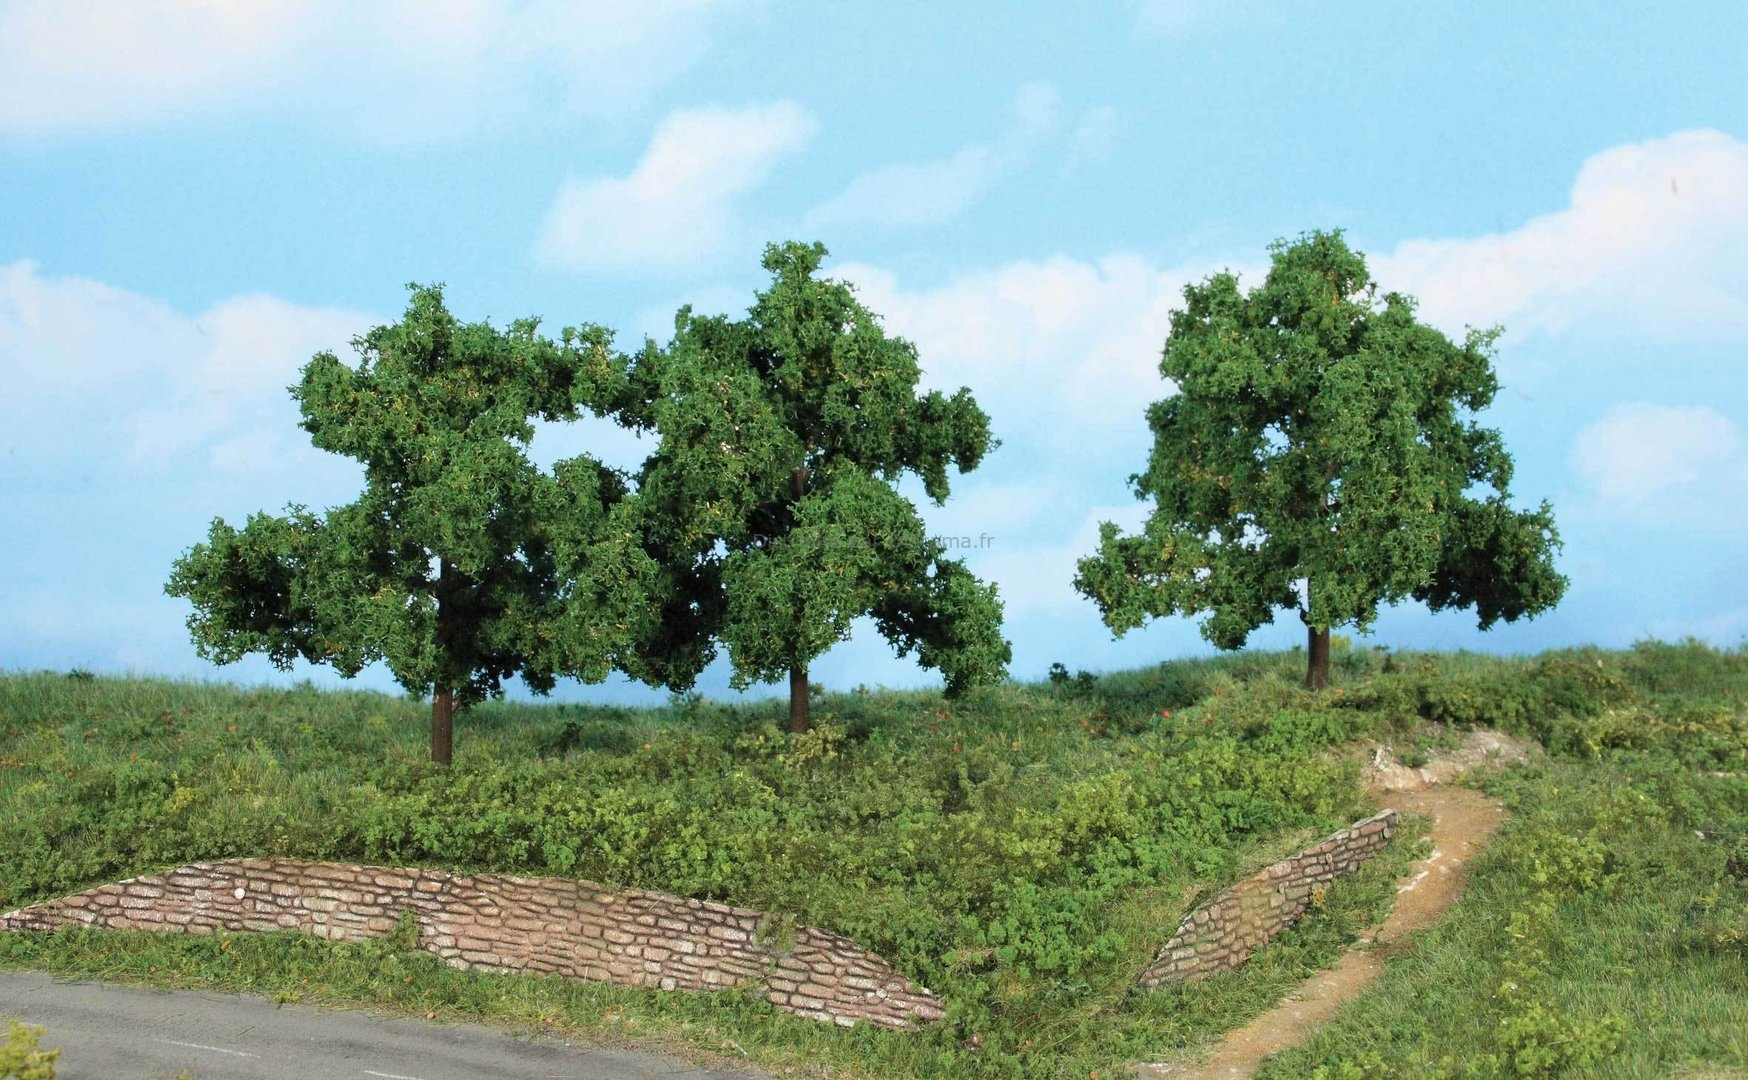 Végétation miniature : 3 arbres fruitiers 13 cm - Heki 1934, 01934